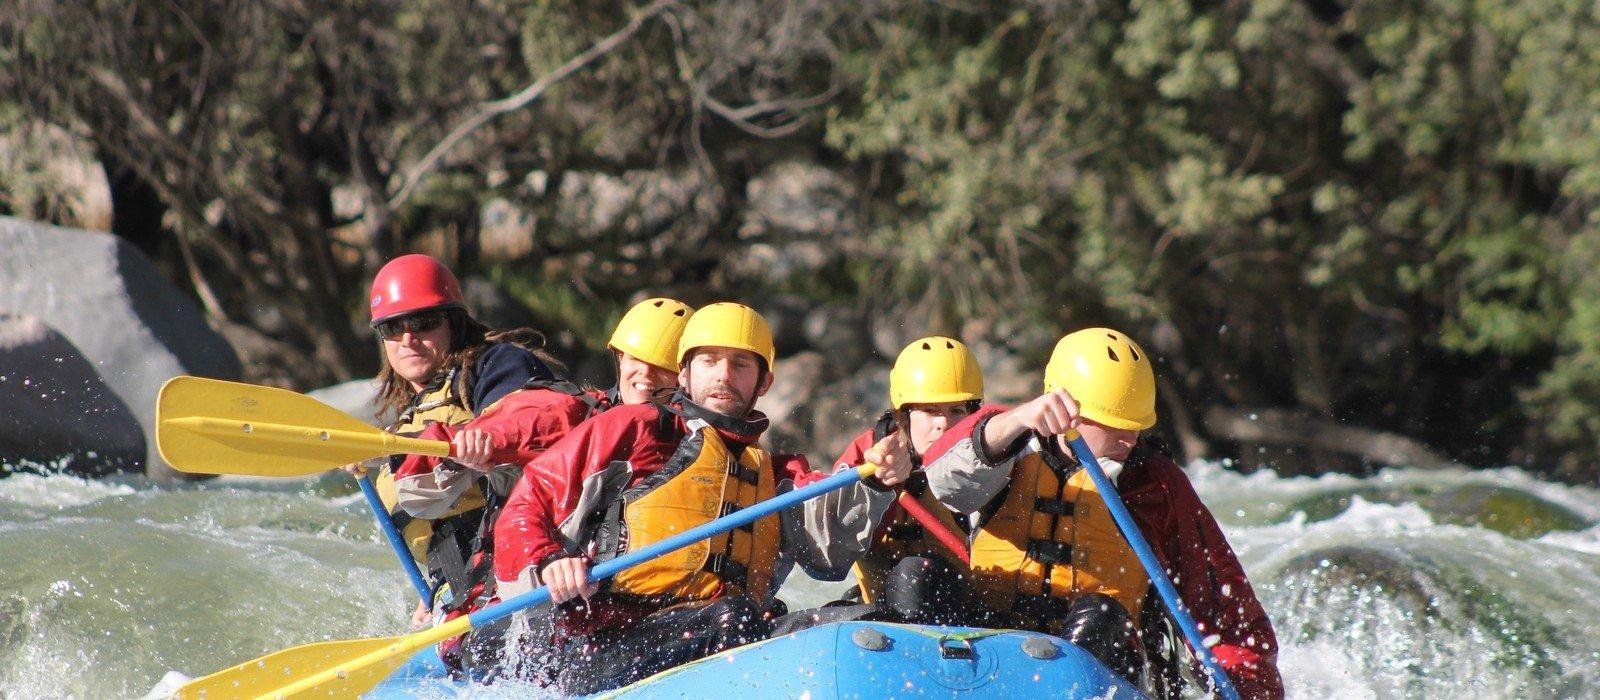 River Rafting and Ziplining at Chuquicahuana